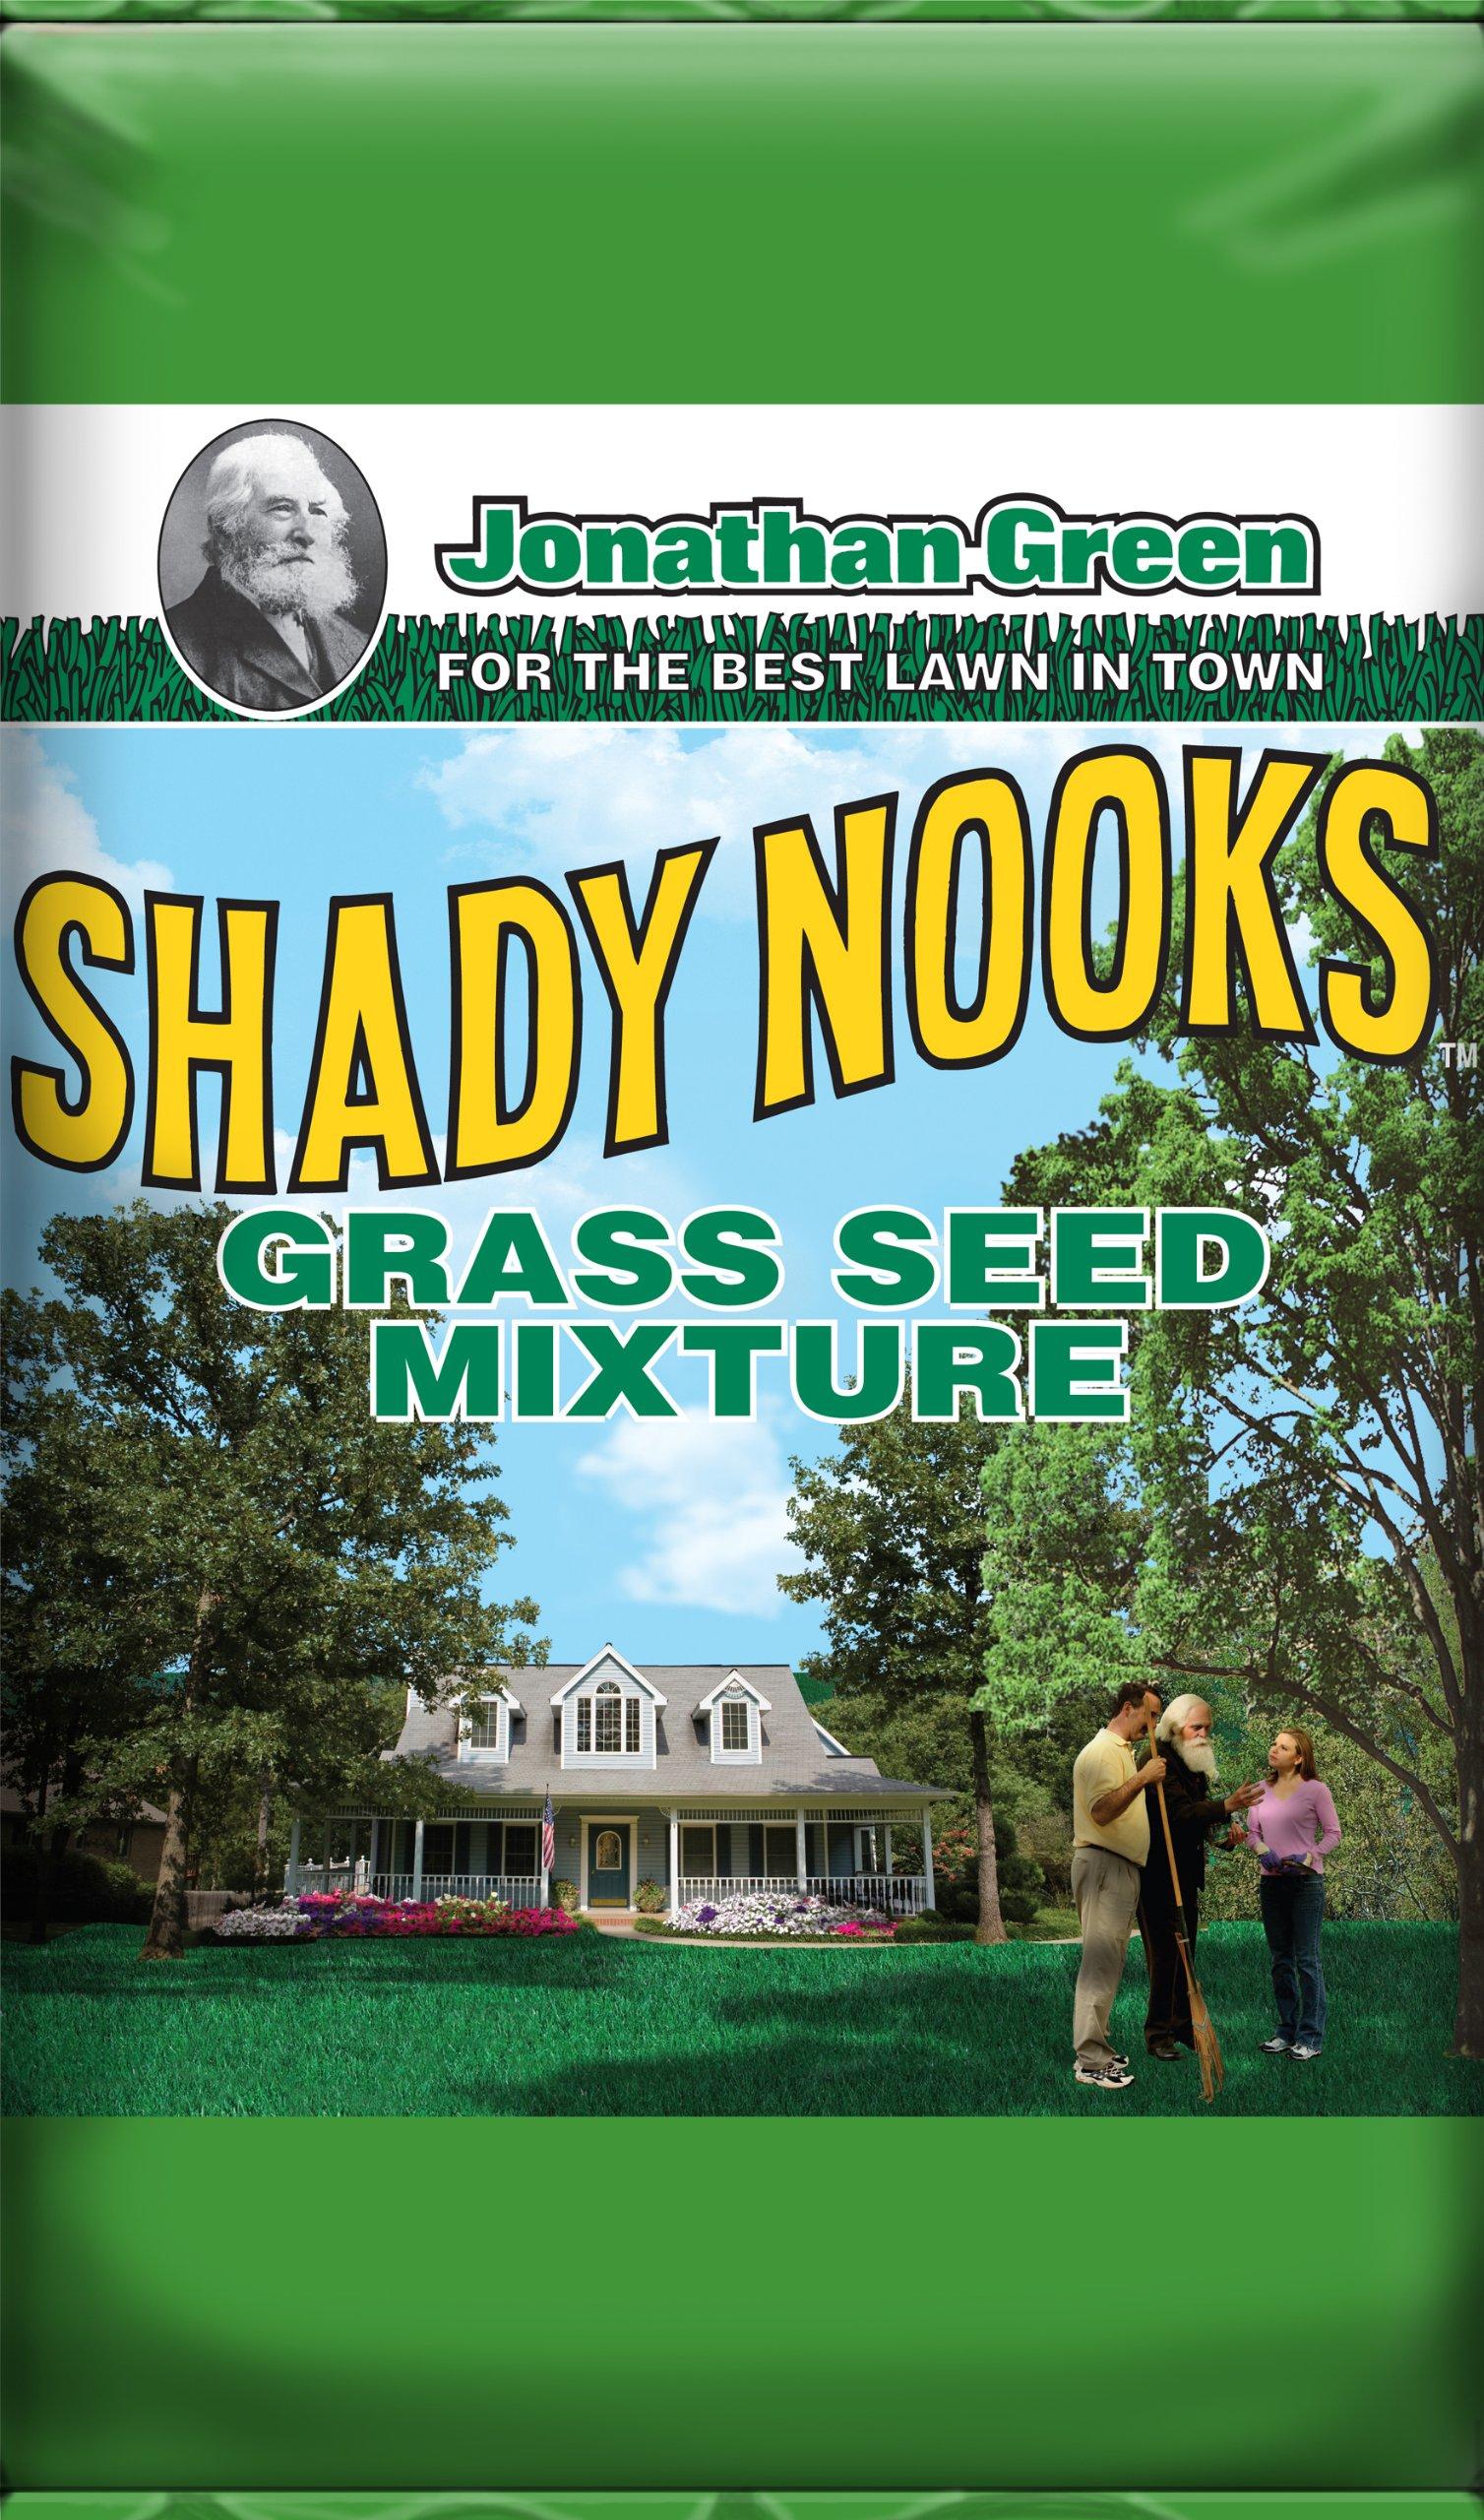 Jonathan Green Shady Nooks Grass Seed, 25-Pound